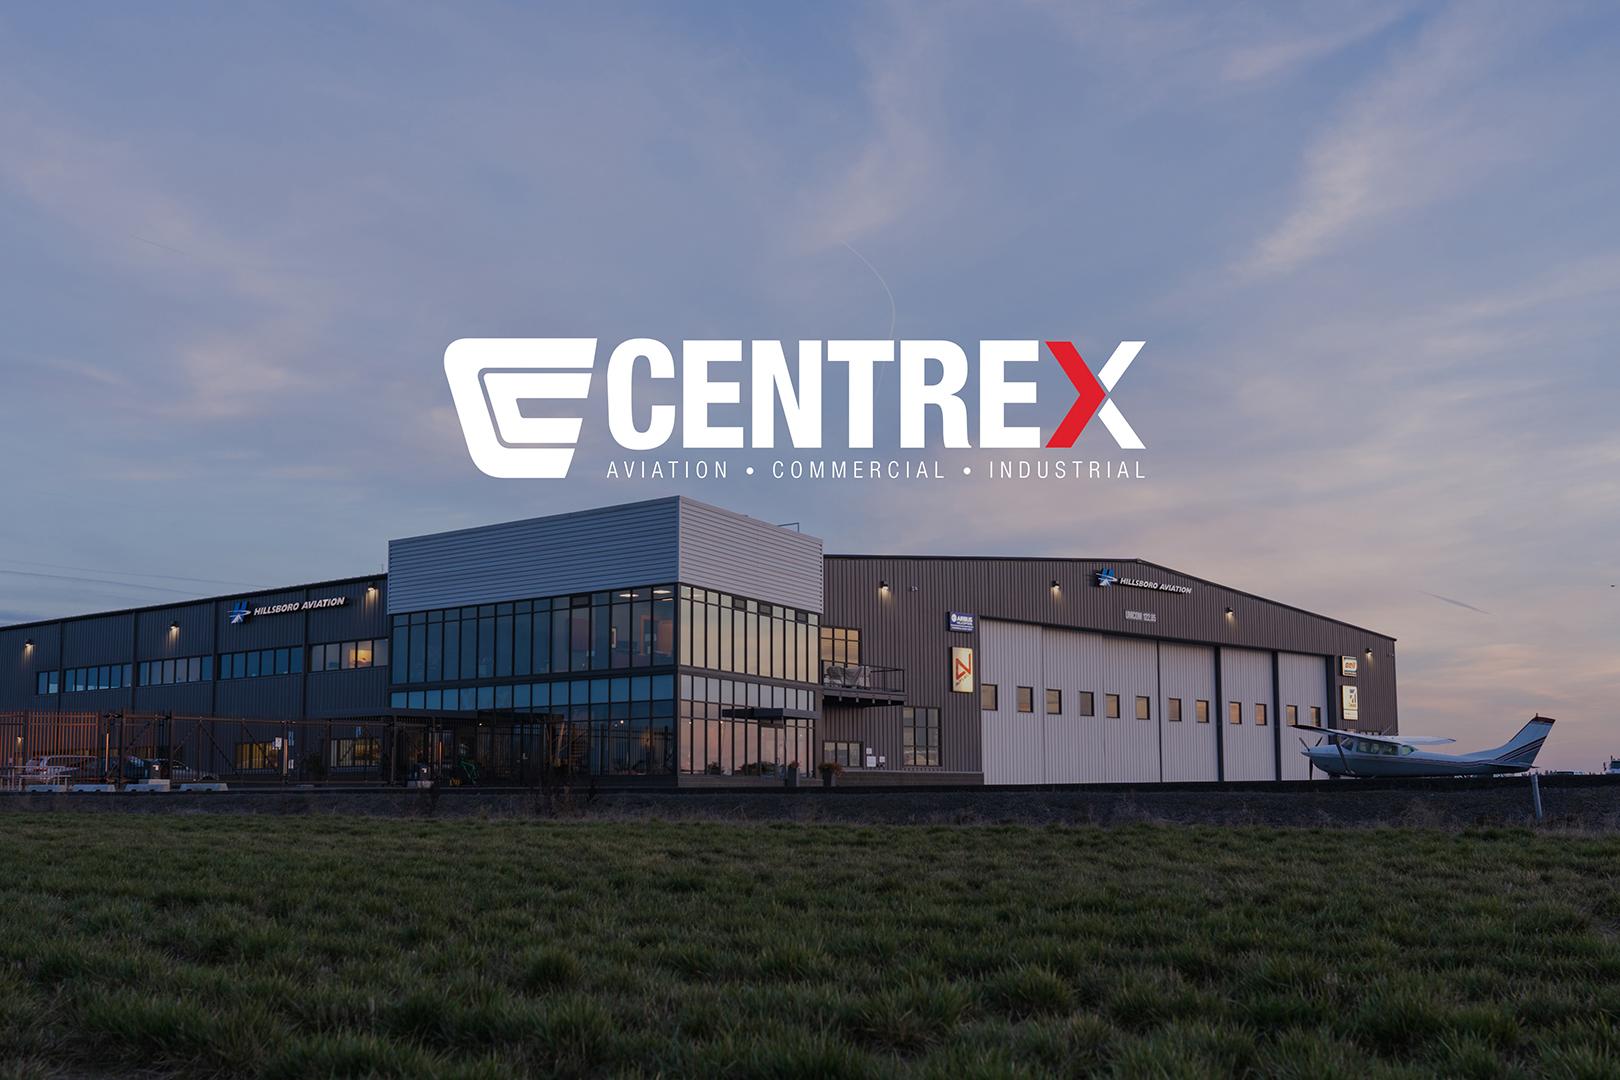 Centrex Thumbnail Image.jpg